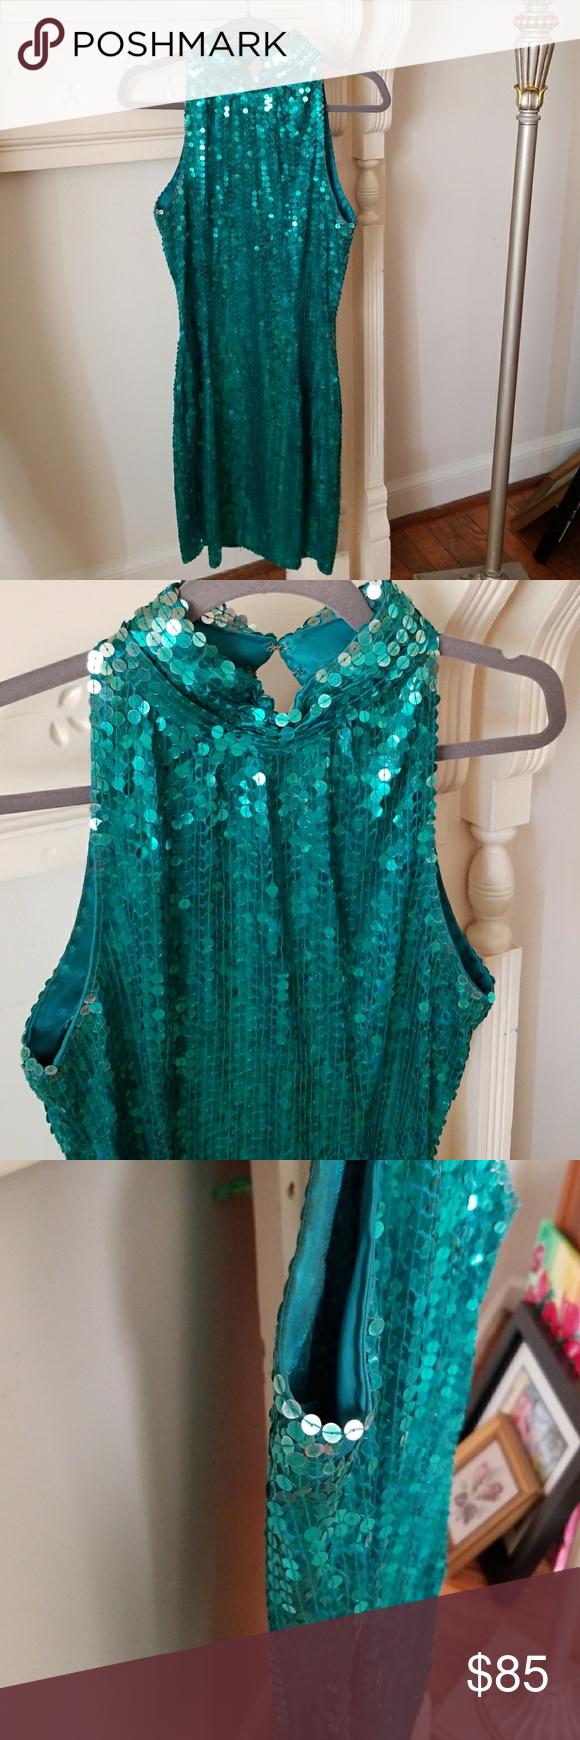 Vtg sequin dress check out the back my posh picks pinterest